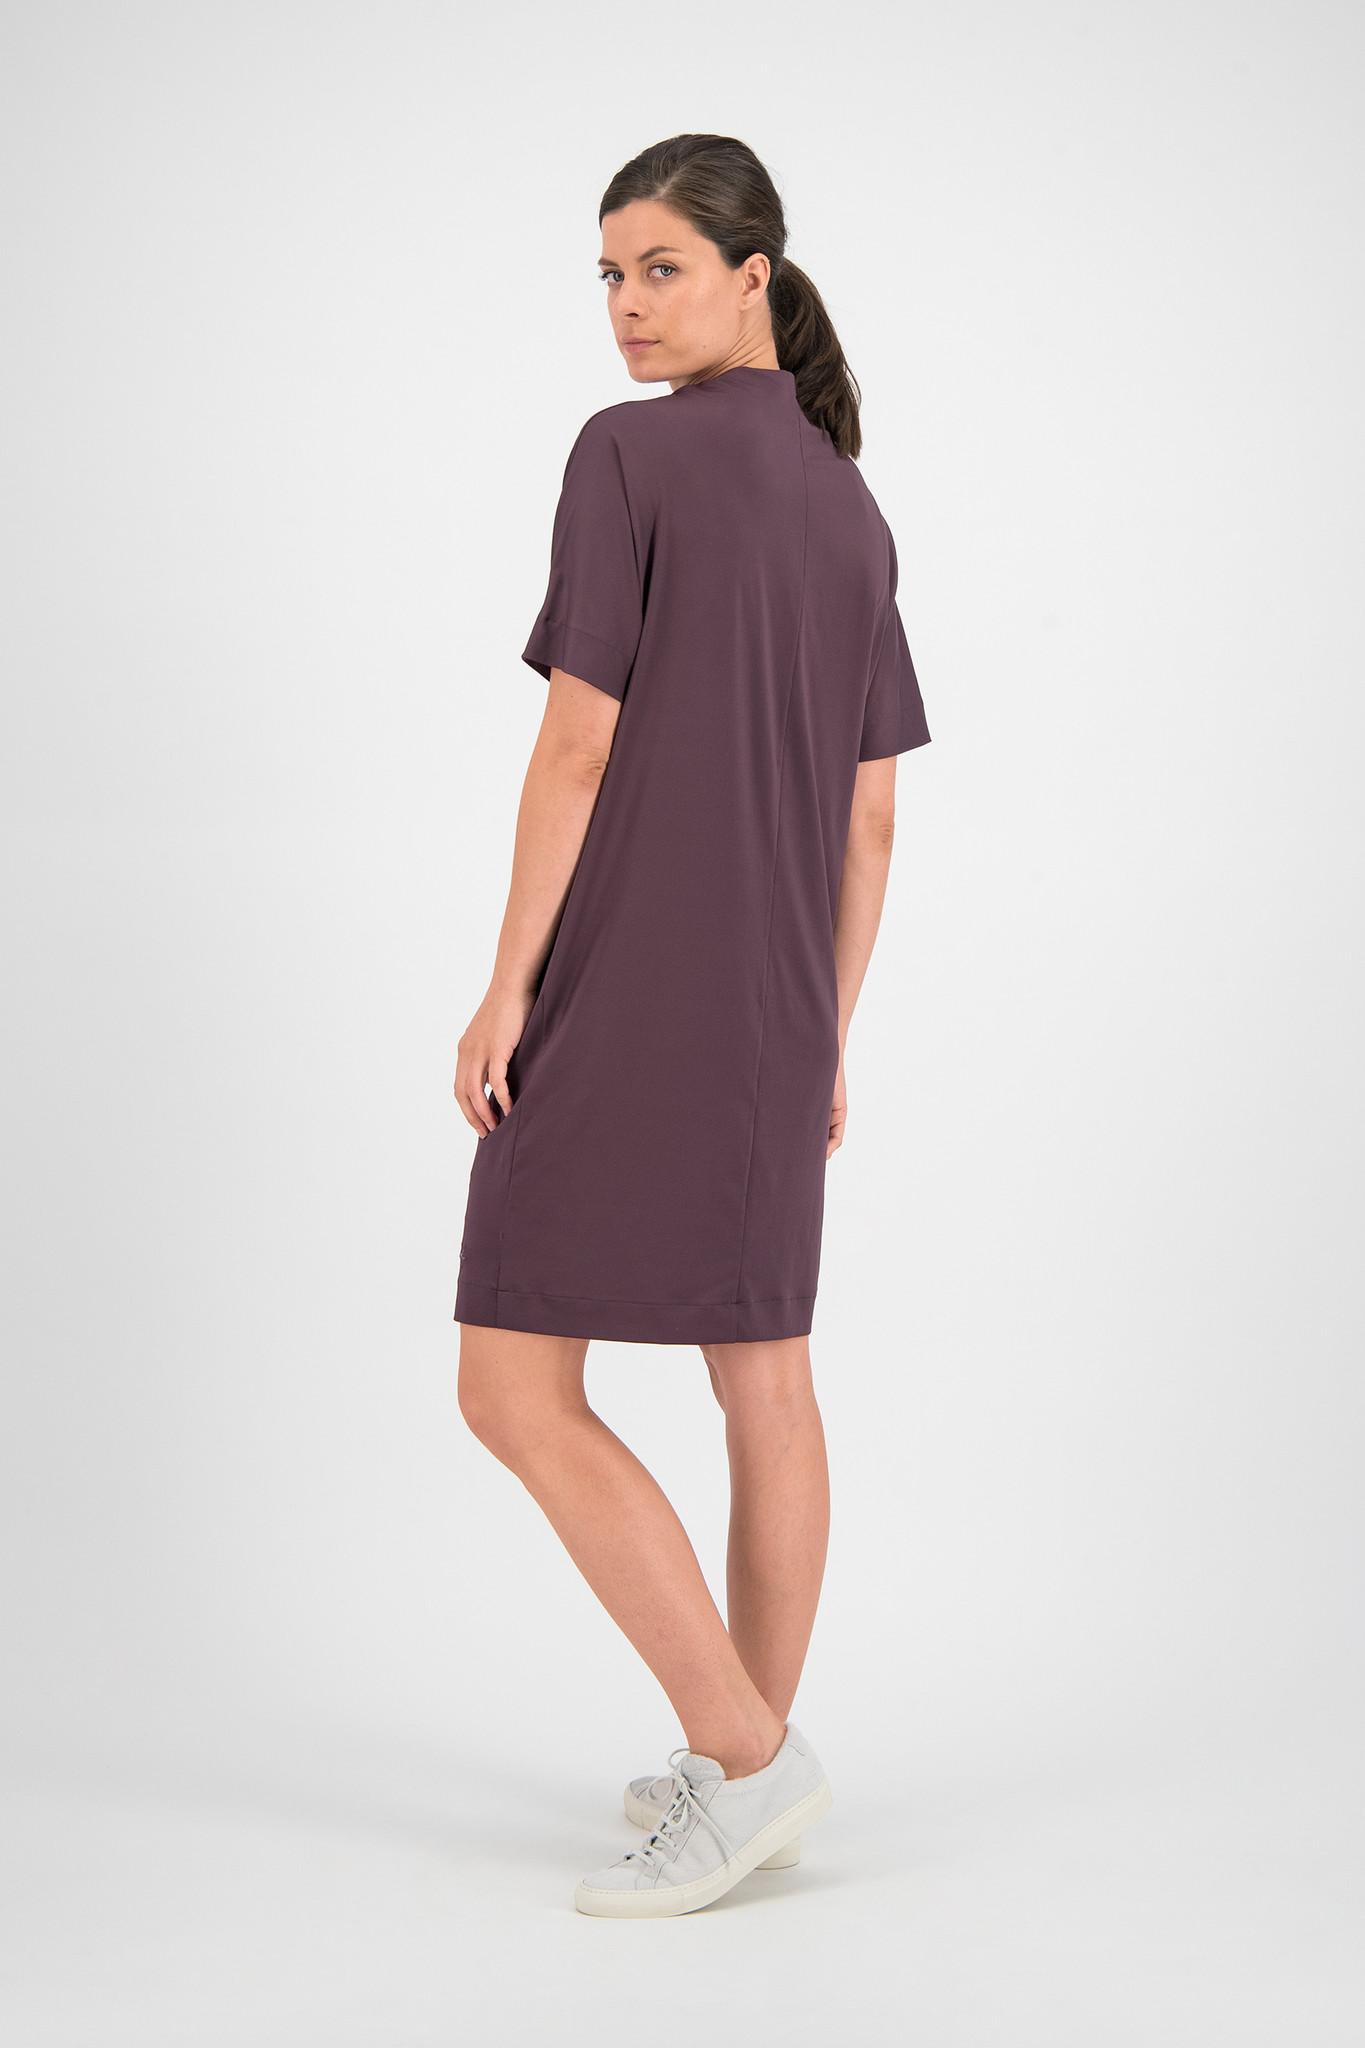 SYLVER Silky Jersey Dress Turtle-neck - Choco Wine